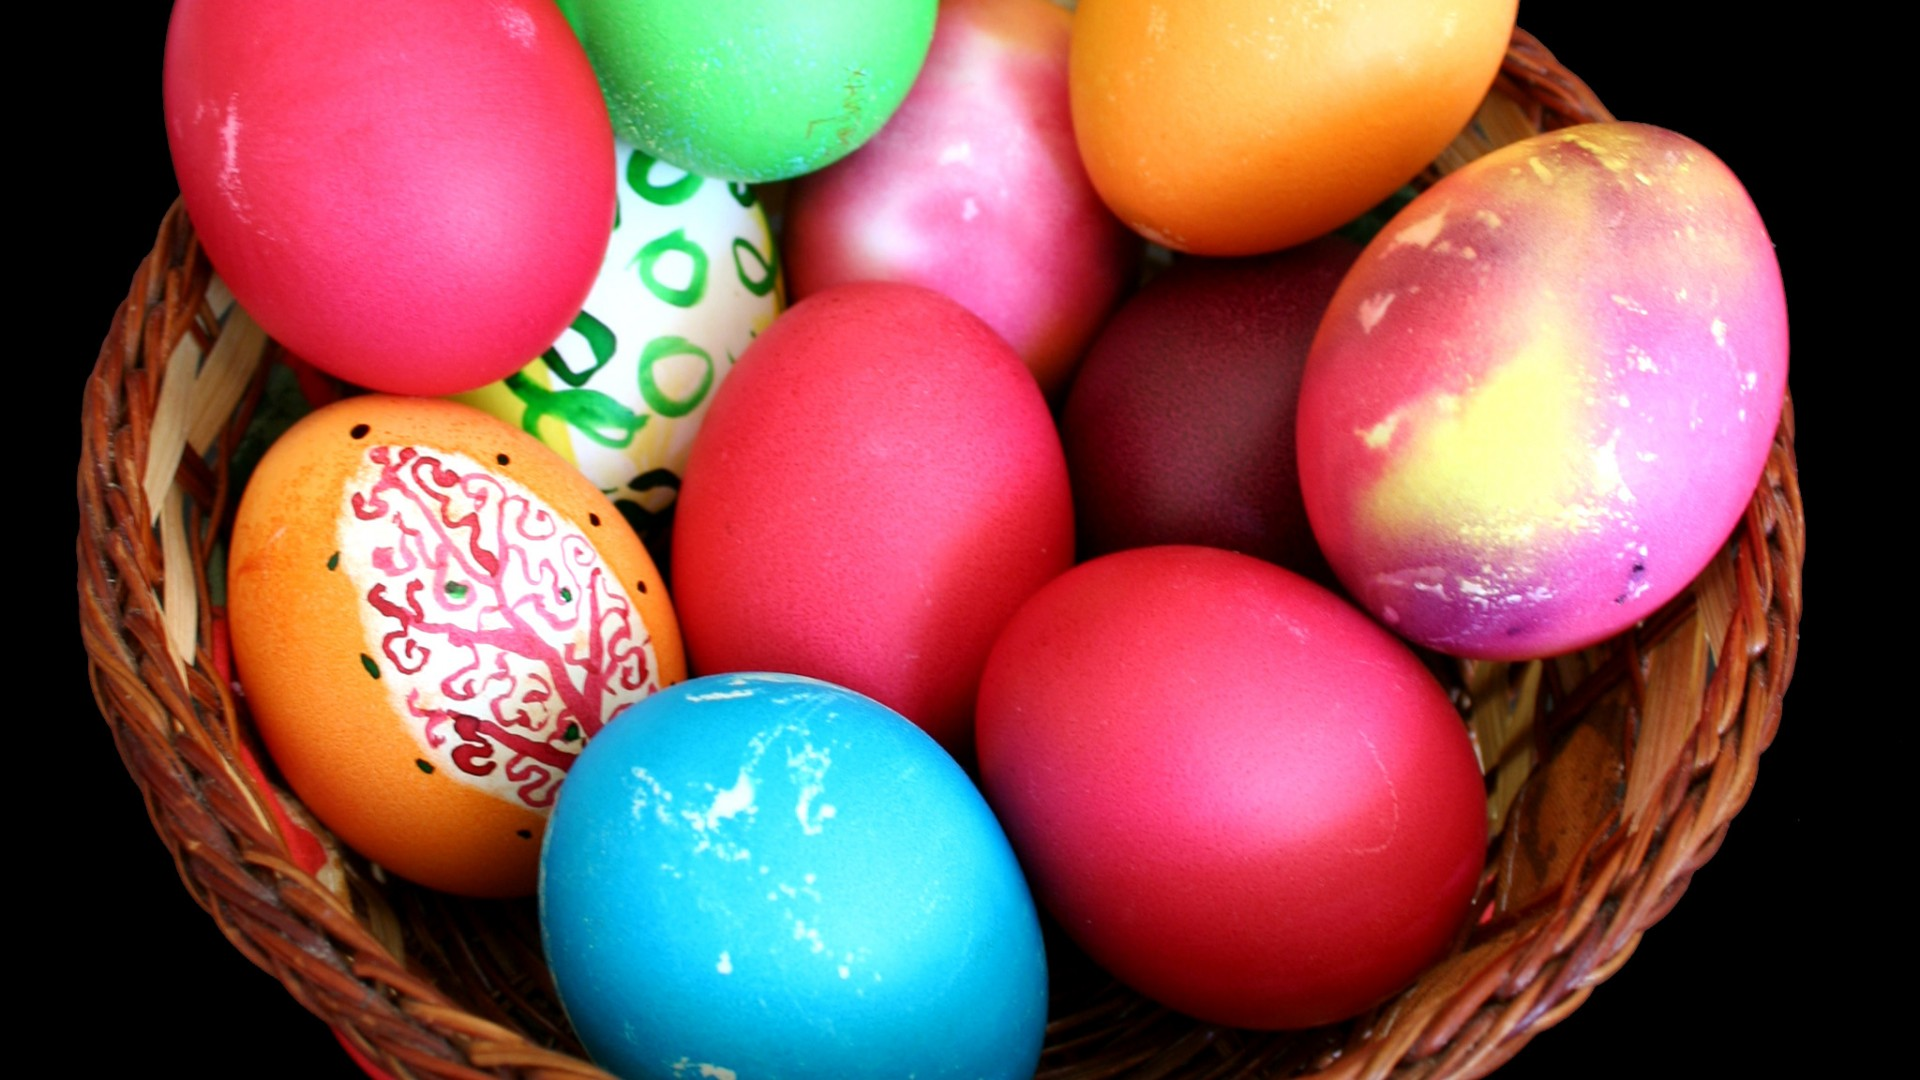 Easter Eggs in Basket Wallpaper   HD Wallpapers 1920x1080